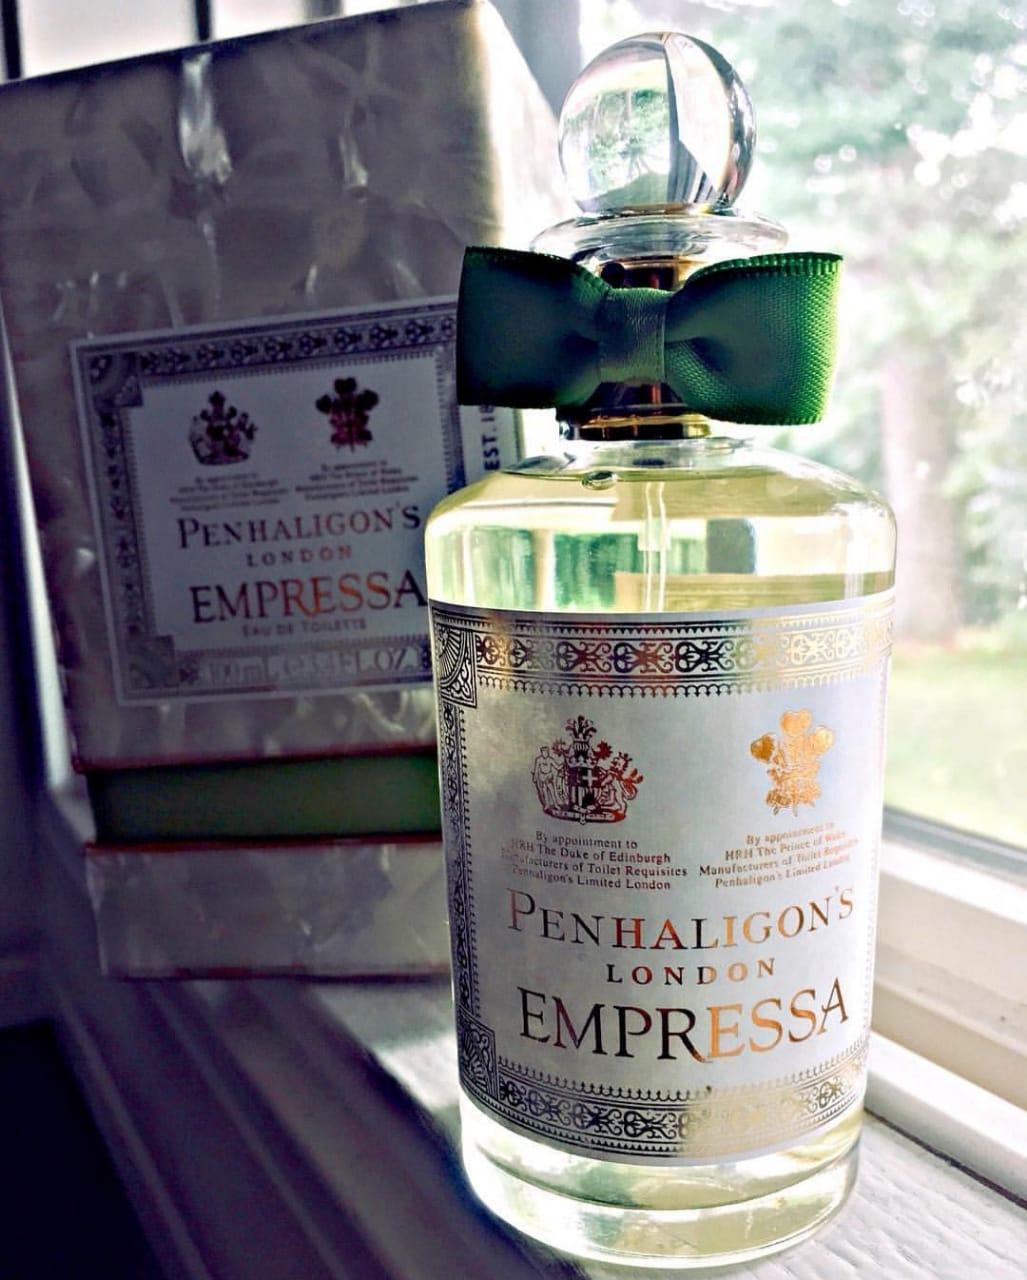 ebb31ede0 إمبريسا بينهاليجينز إيدي تواليت Empressa Penhaligon's EdT | متجر عطرك